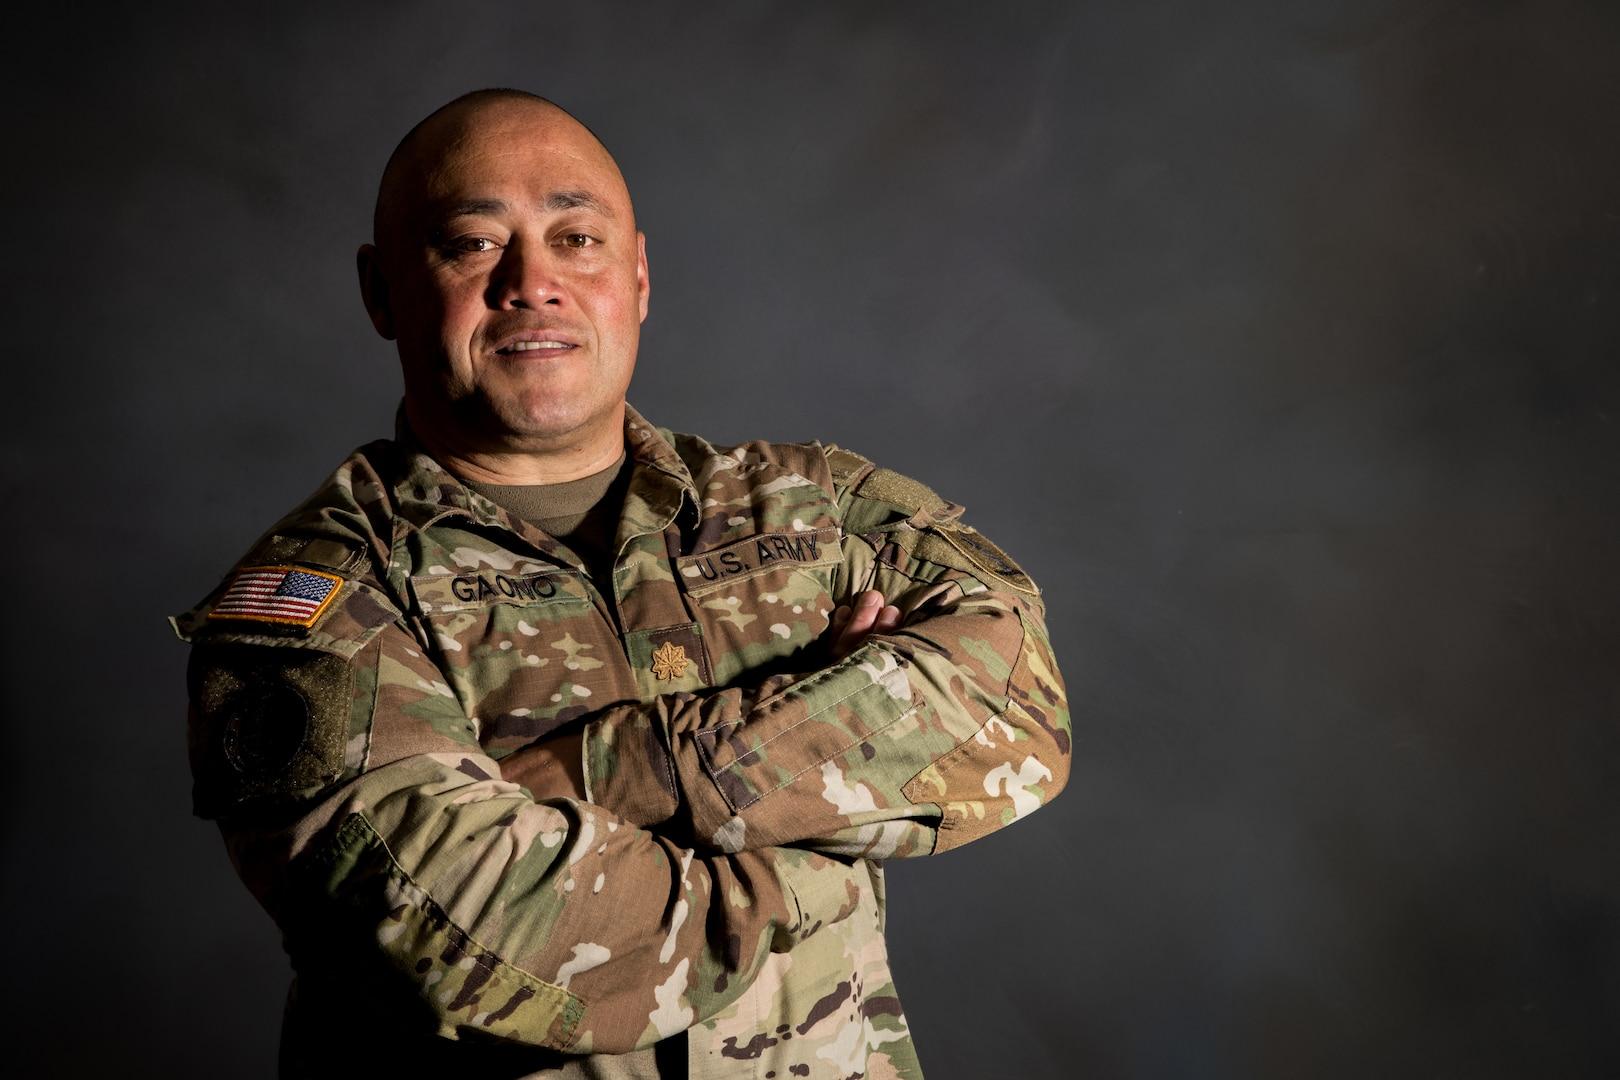 Missouri National Guard Maj. McClellan (Mac) Gaono-Taiese, mobilization plans officer, poses for a studio portrait May 13, 2020, at Ike Skelton Training Site, Jefferson City, Missouri.